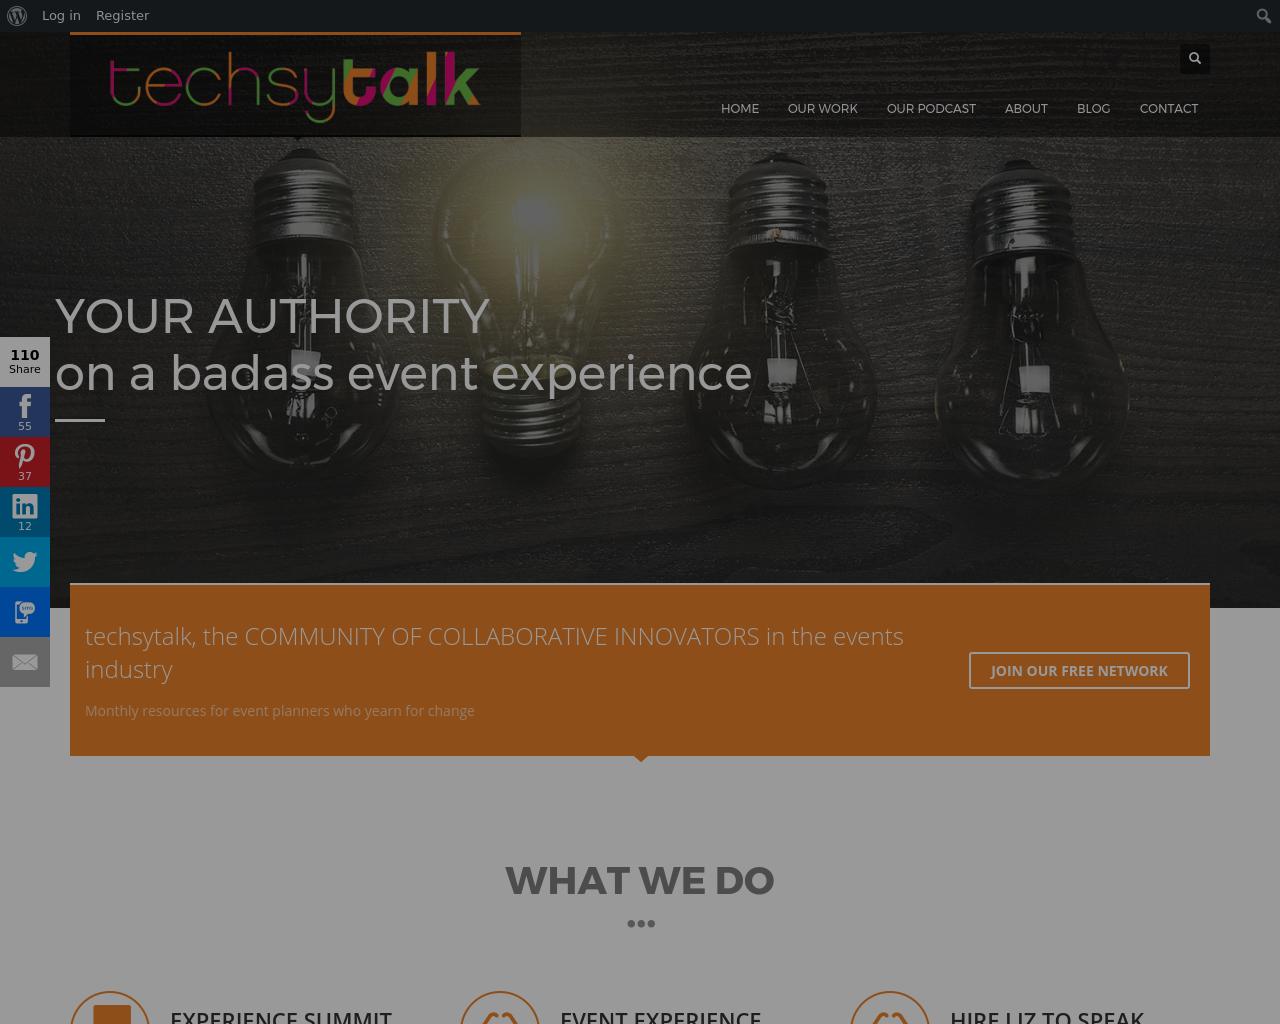 TechsyTalk-Advertising-Reviews-Pricing